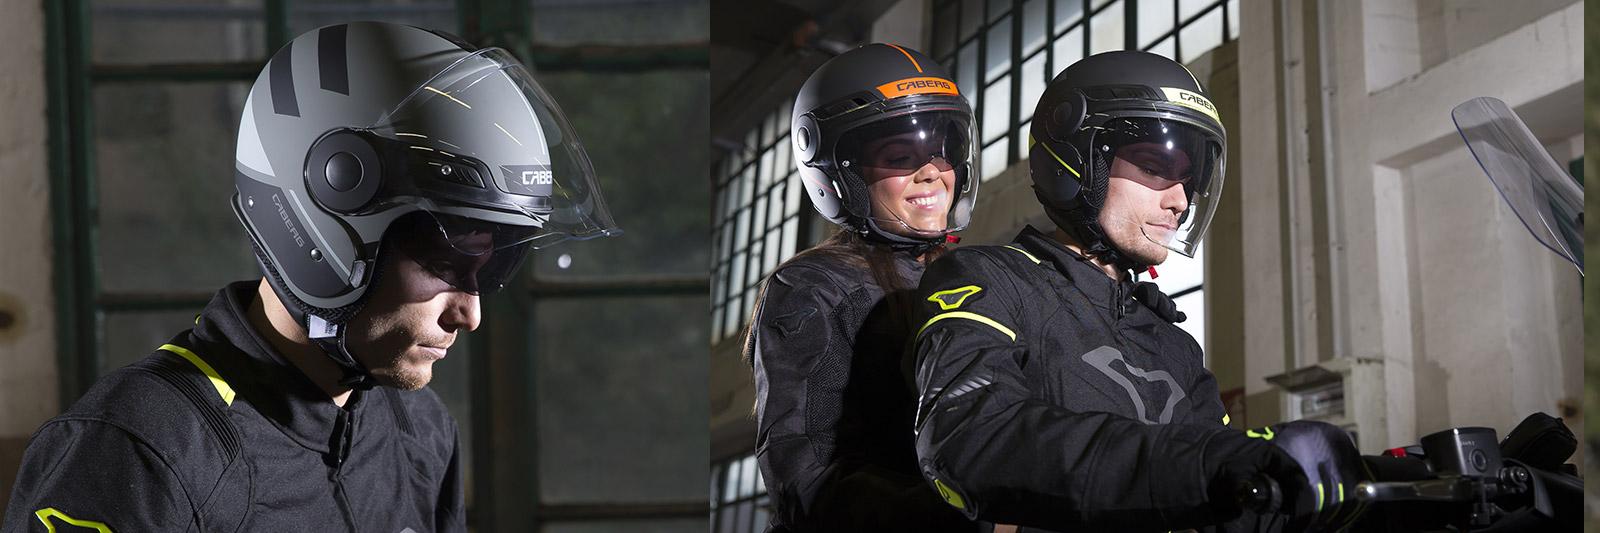 Caberg Uptown helmet characteristics